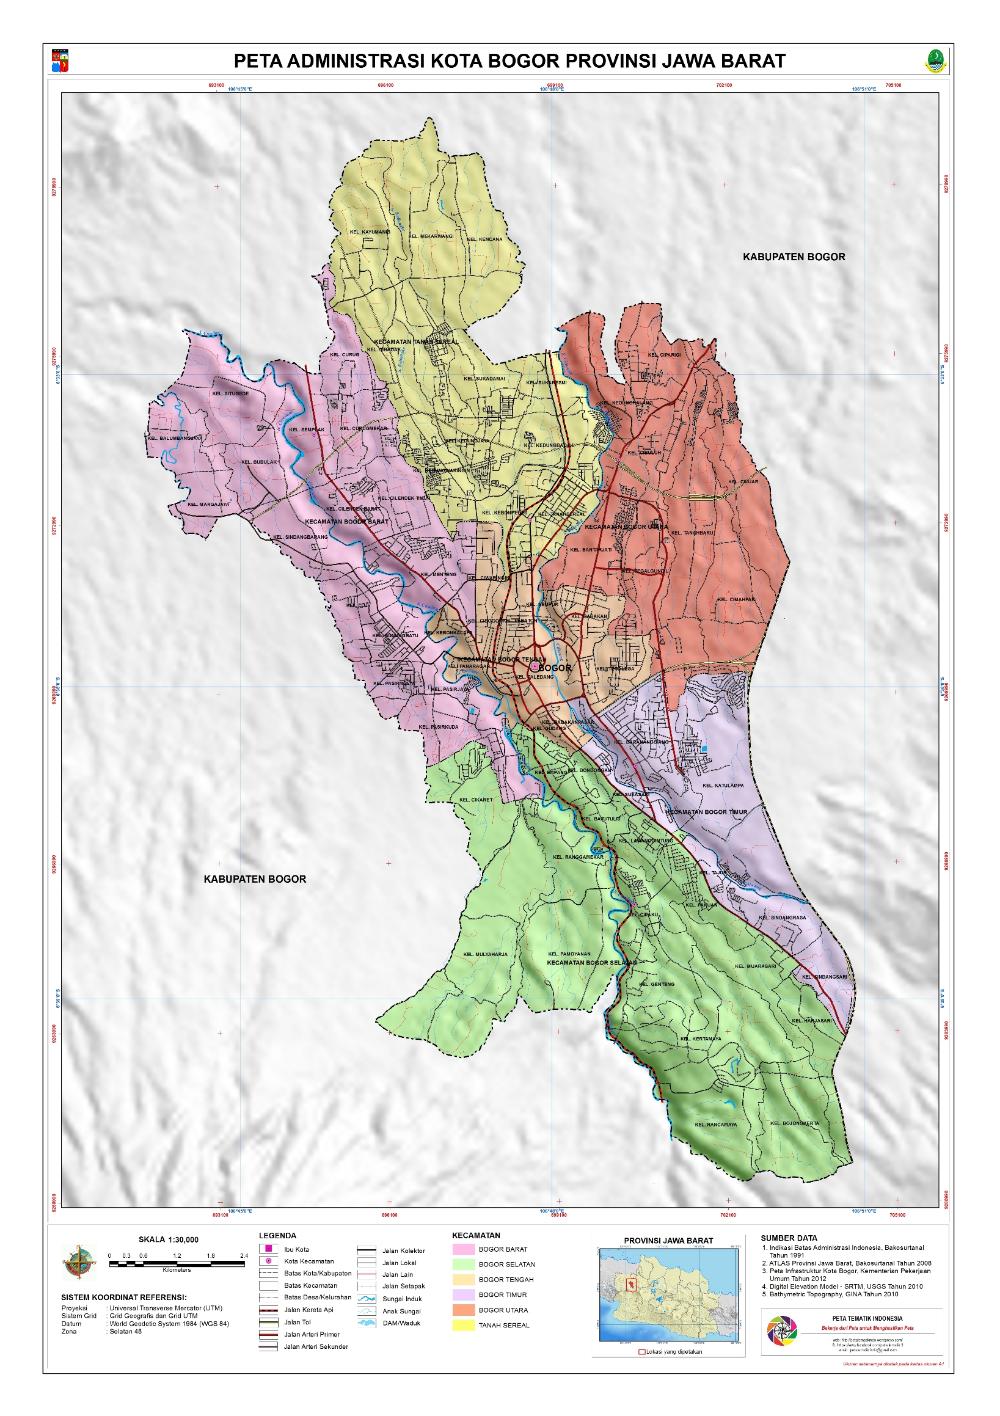 Pin Oleh Stephanus Bambang Siyamta Di Peta Wilayah